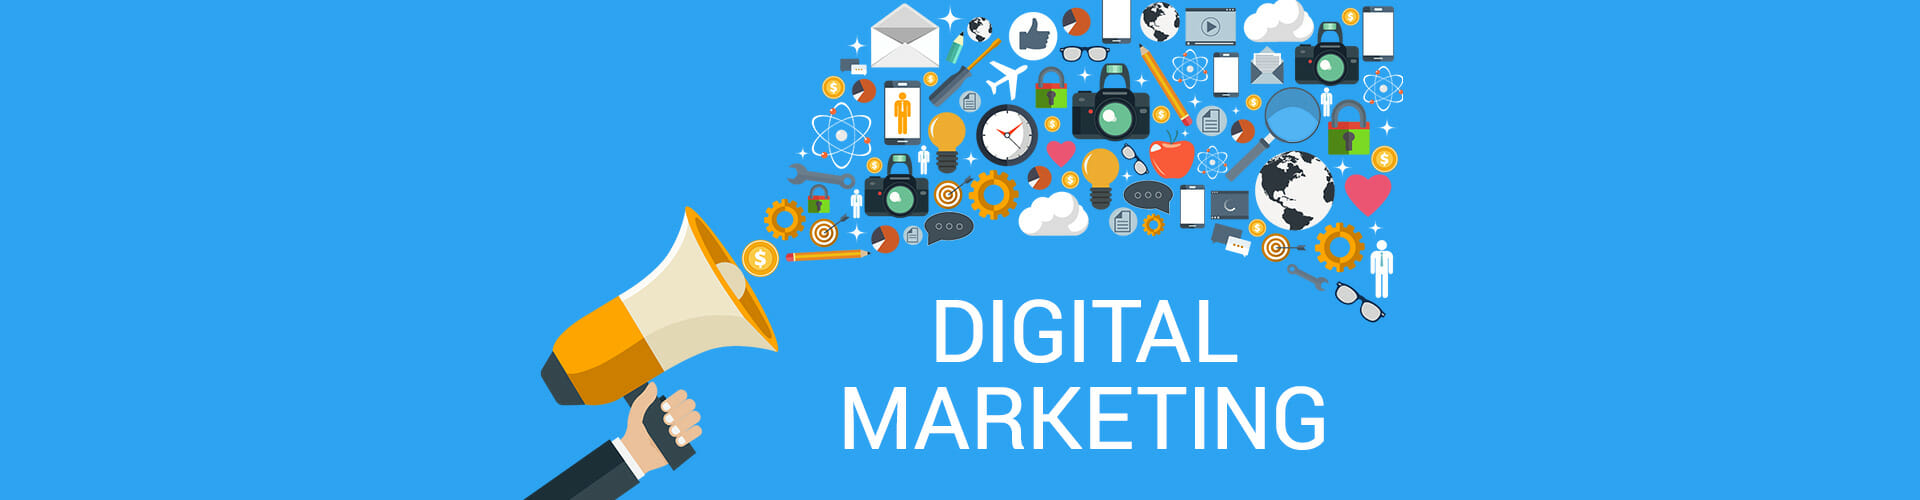 Digital marketing service in India